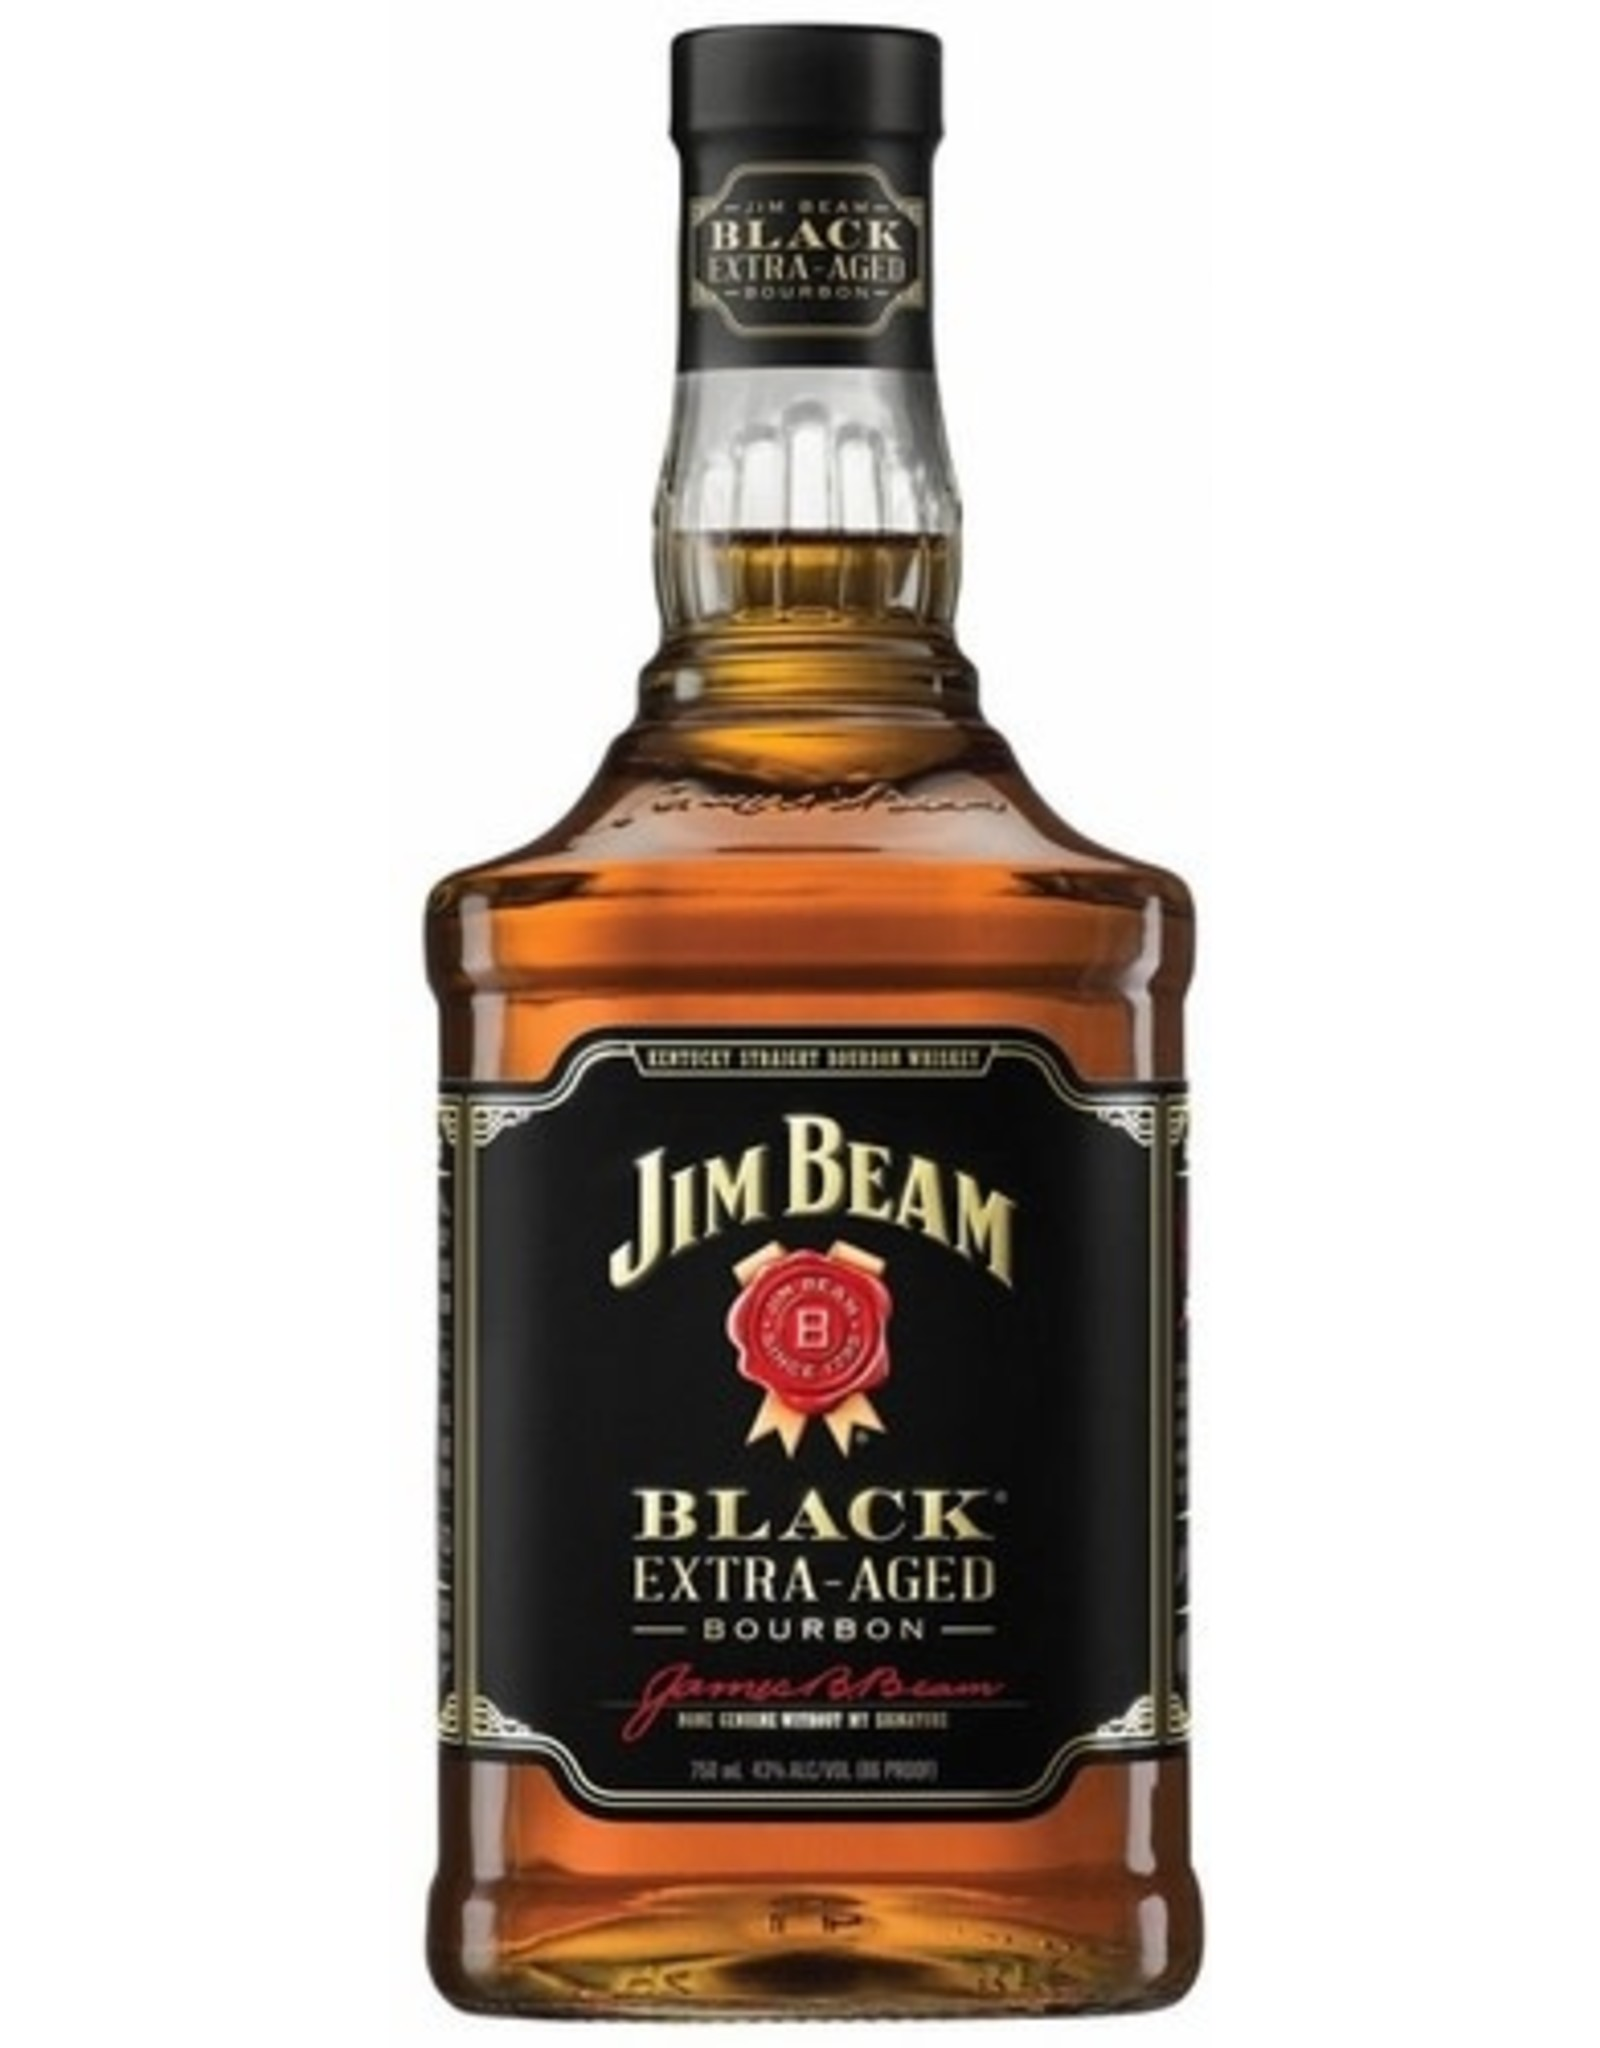 JIM BEAM BLACK KENTUCKY BOURBON 1.75L